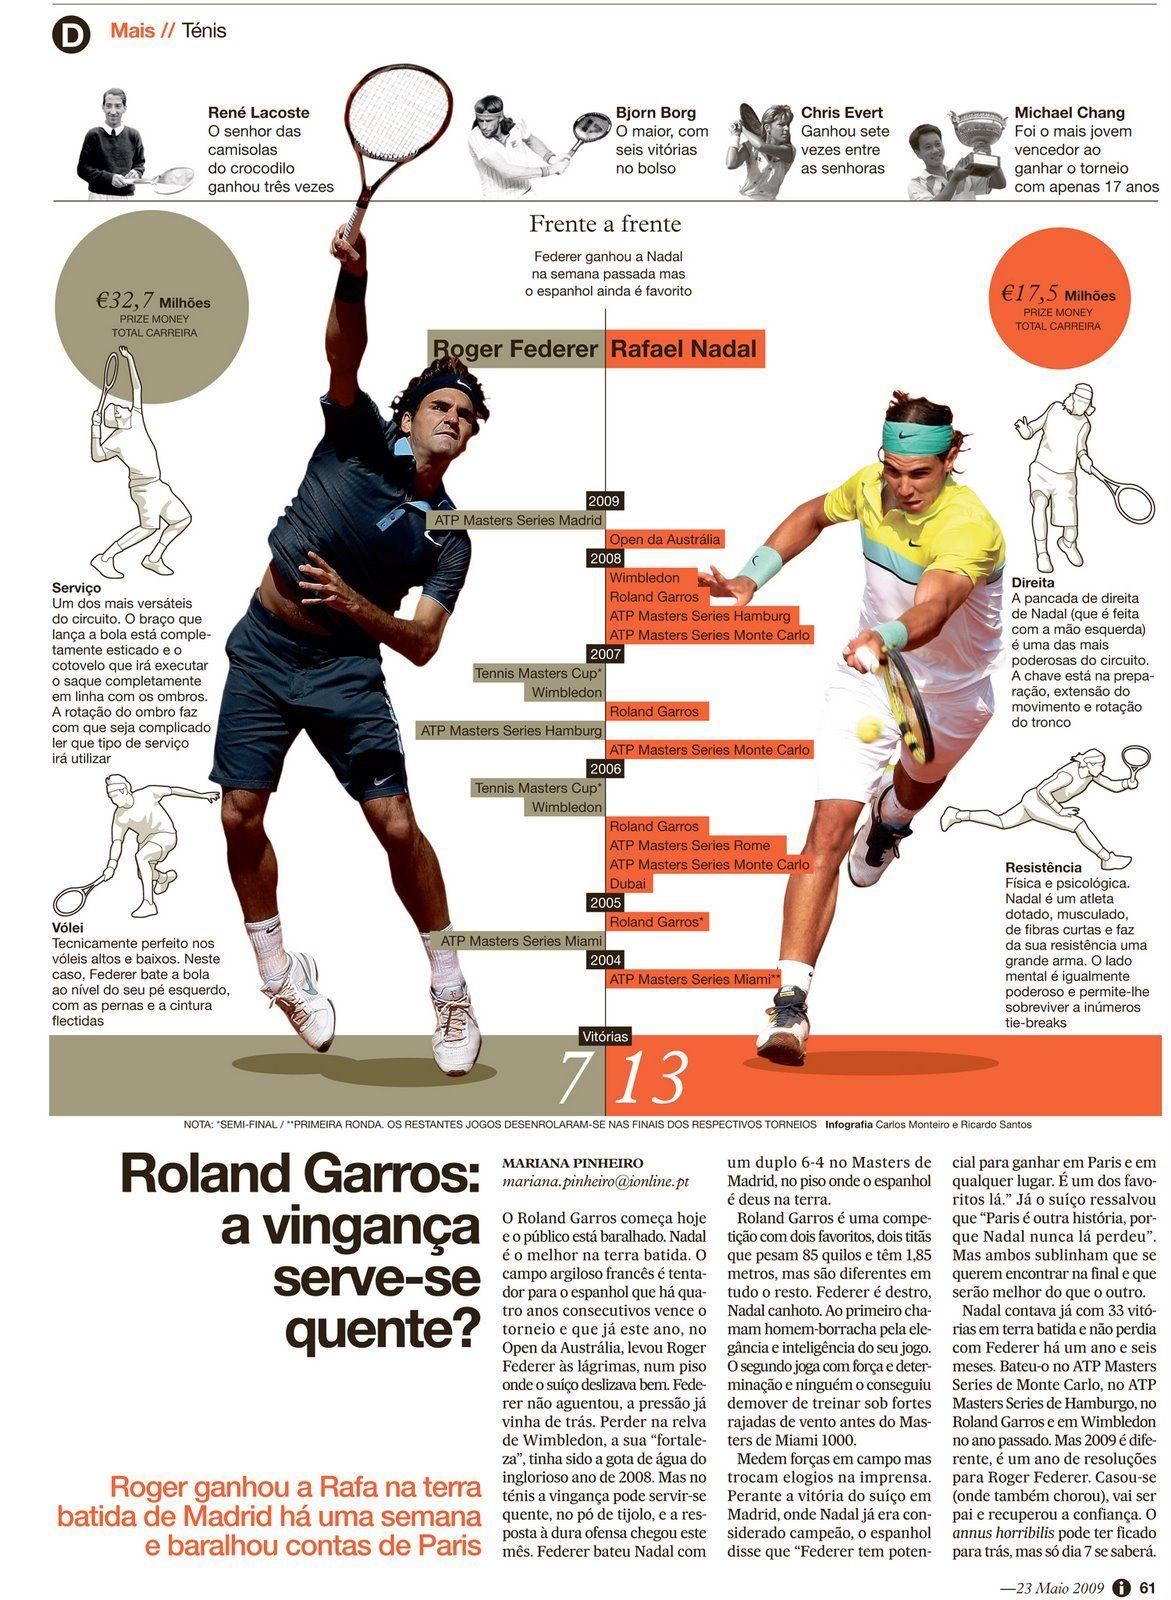 Roger Federer Vs Rafael Nadal Comparing Rivals 2010 Infographic Data Visualization Roger Federer